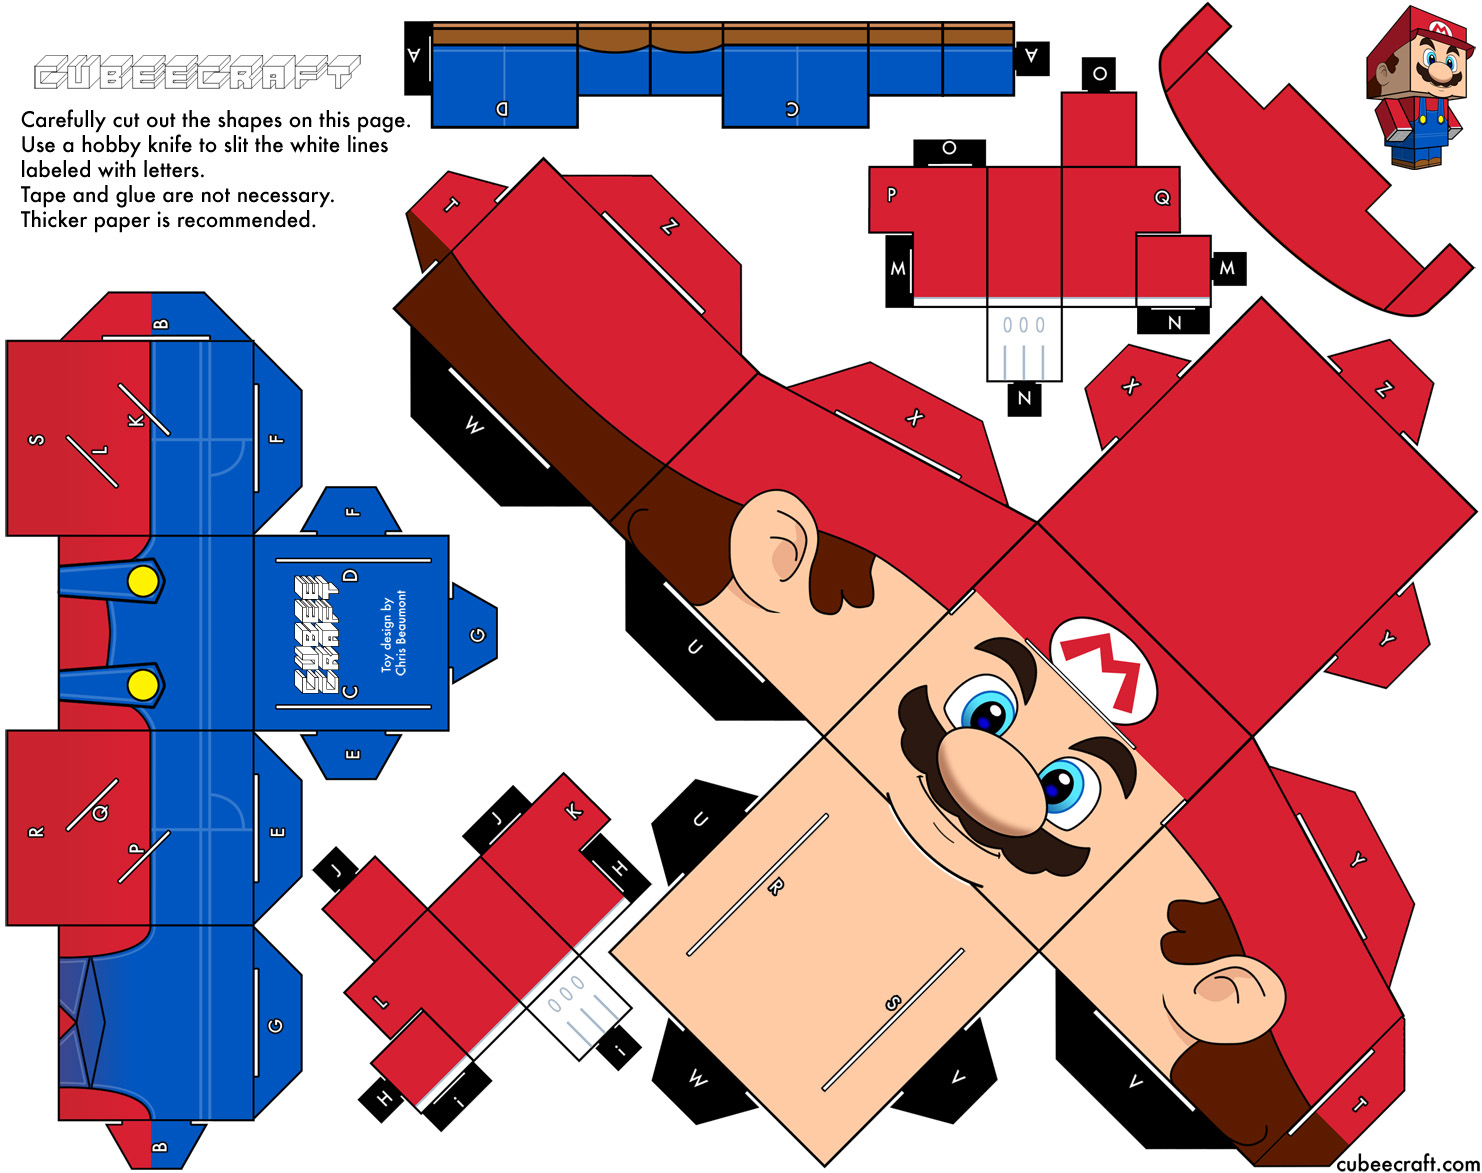 mario_bros___cubeecraft___papercraft_by_marcokobashigawa-d6z2mps